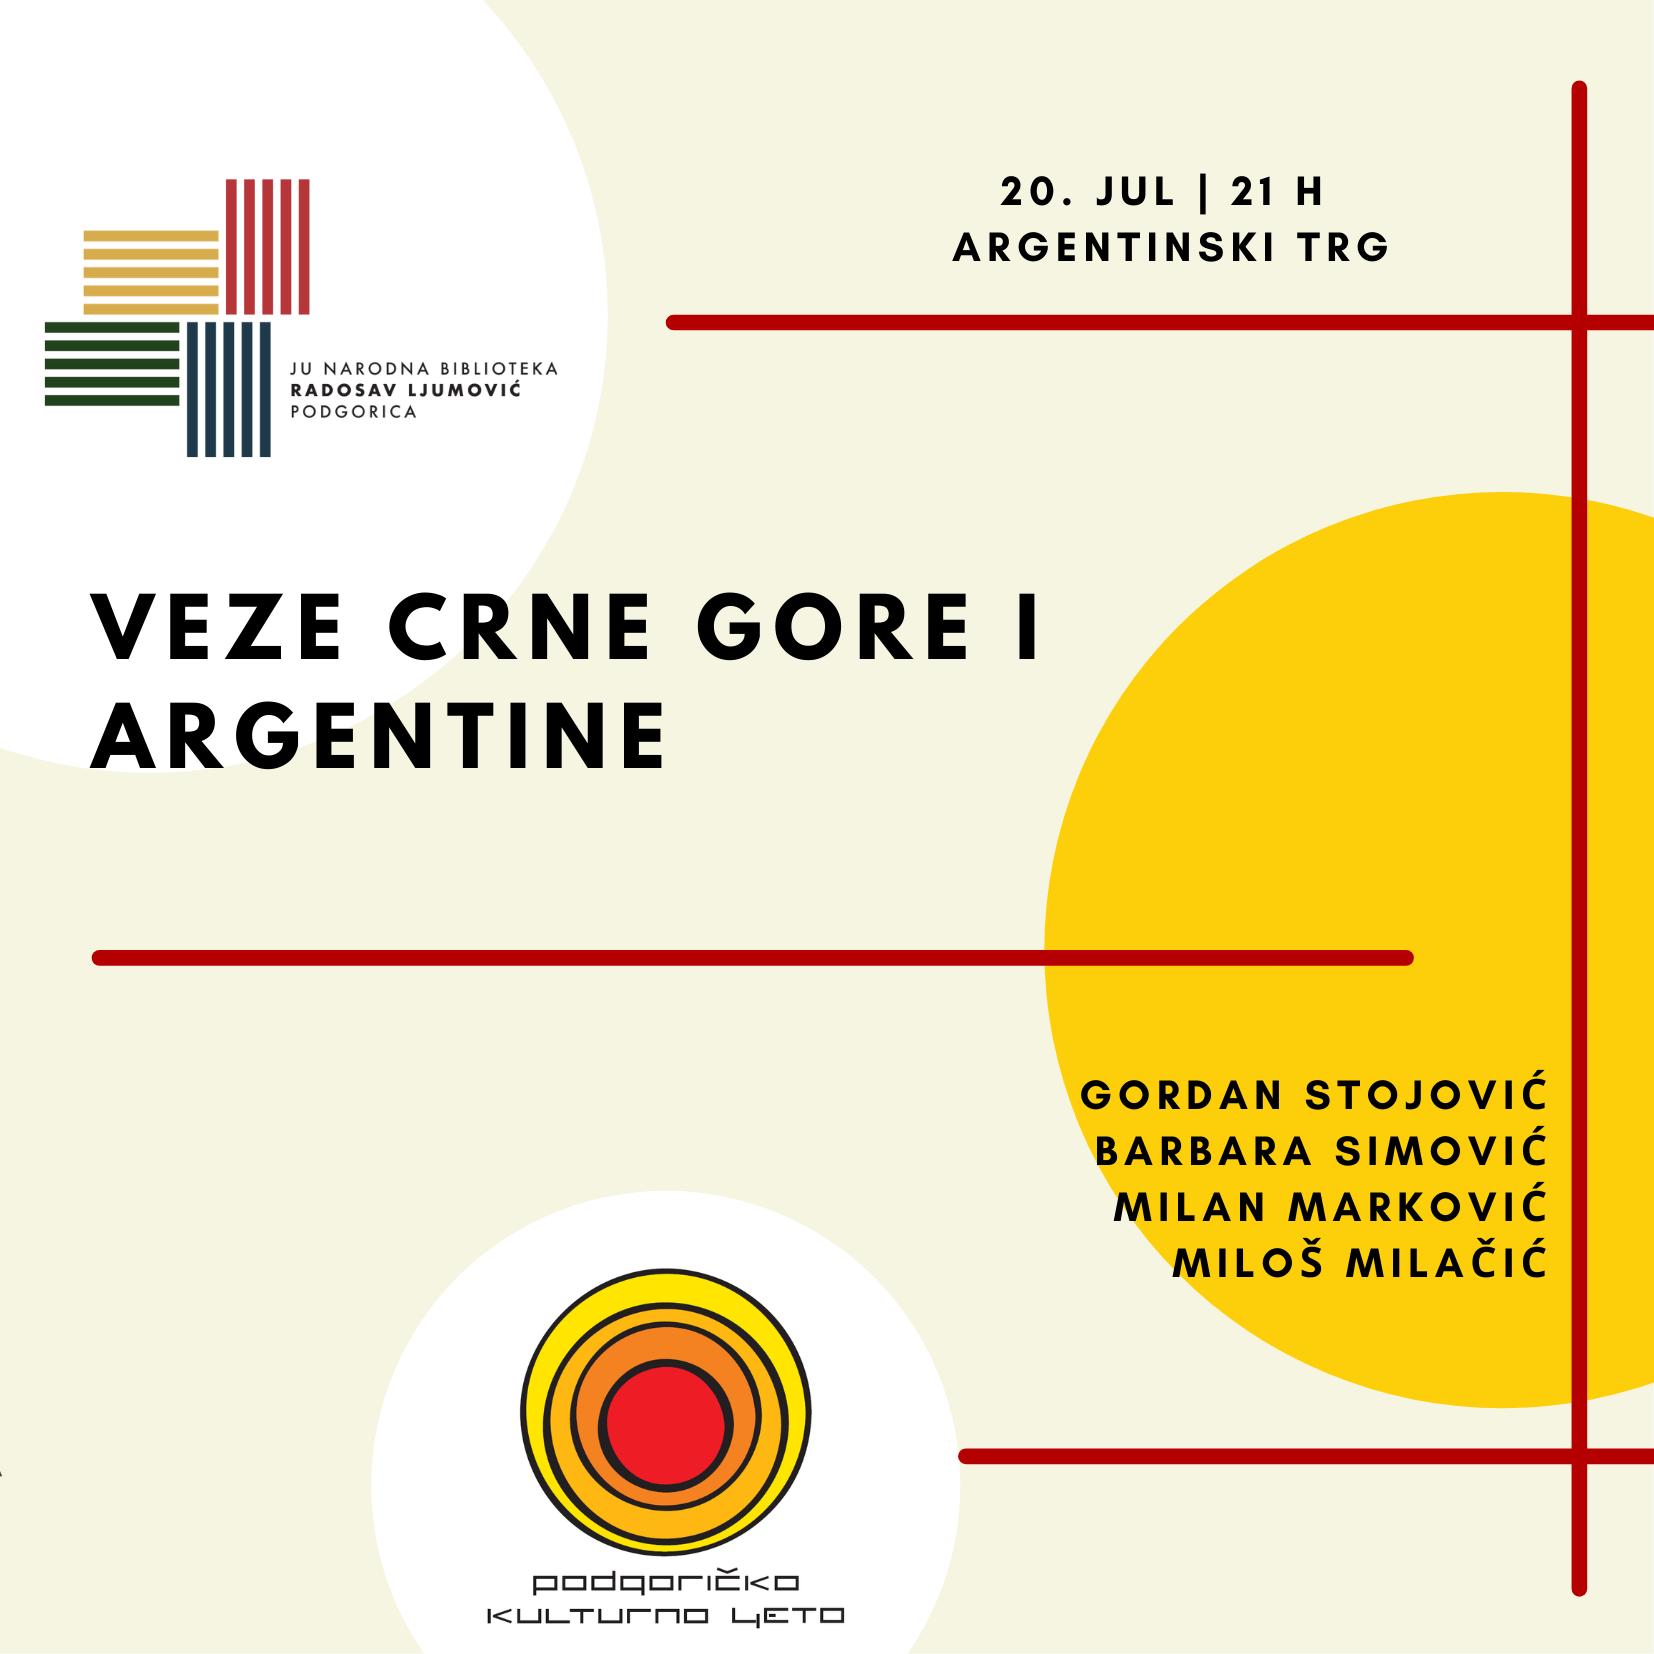 VEZE CRNE GORE I ARGENTINE